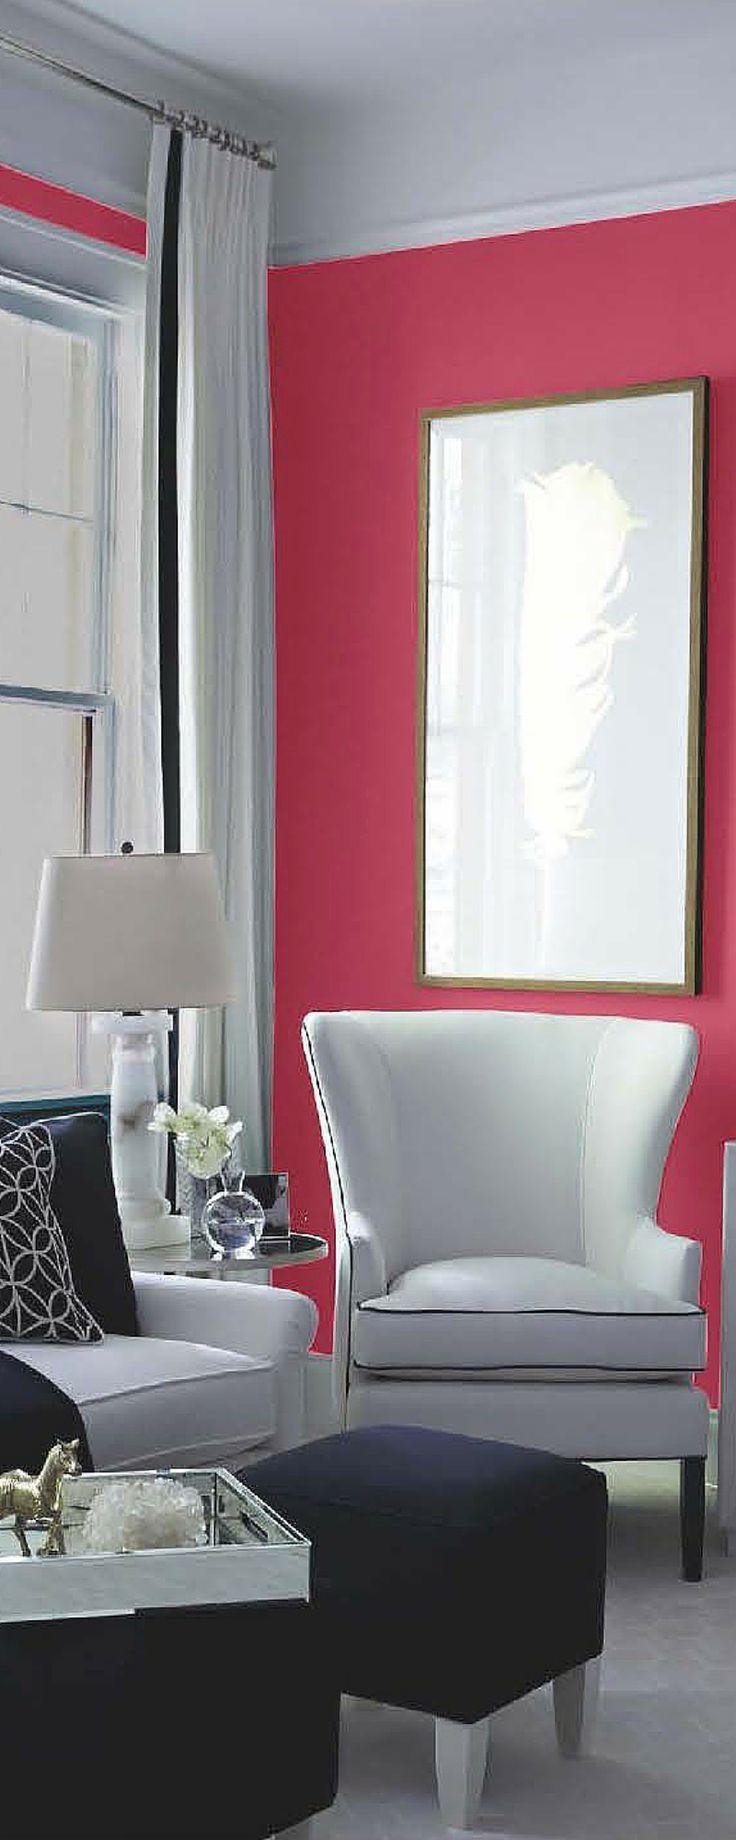 123 best pratt lambert paint colors images on pinterest paint colors wall colors and colors. Black Bedroom Furniture Sets. Home Design Ideas